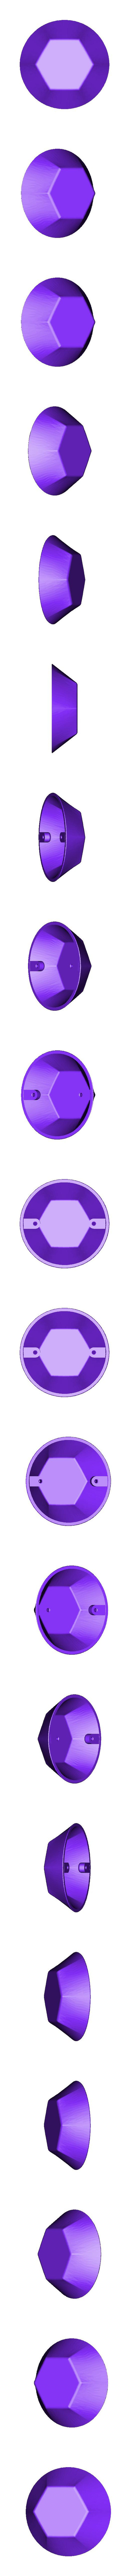 Steven Universe GemPURPLE-TOP.STL Download STL file Steven Universe LED GEM, Wearable Glow Light Up Crystal Prop Amethyst Rose Quartz Pearl, Cosplay, Costume, Halloween • 3D printer model, mechengineermike